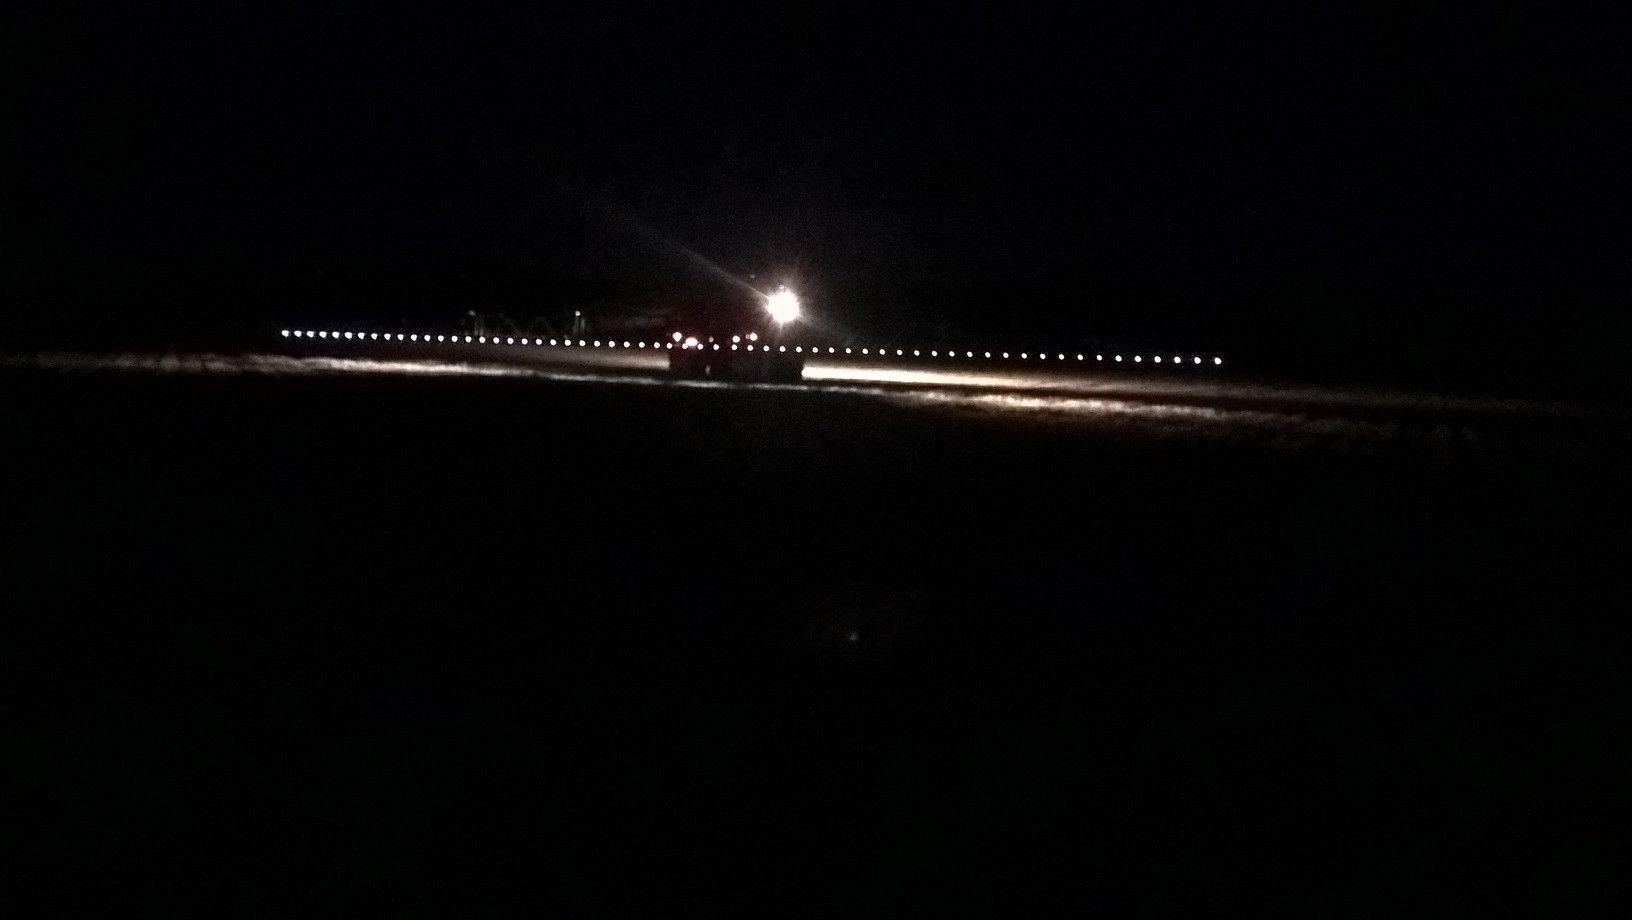 Amazone Spraying in darkness